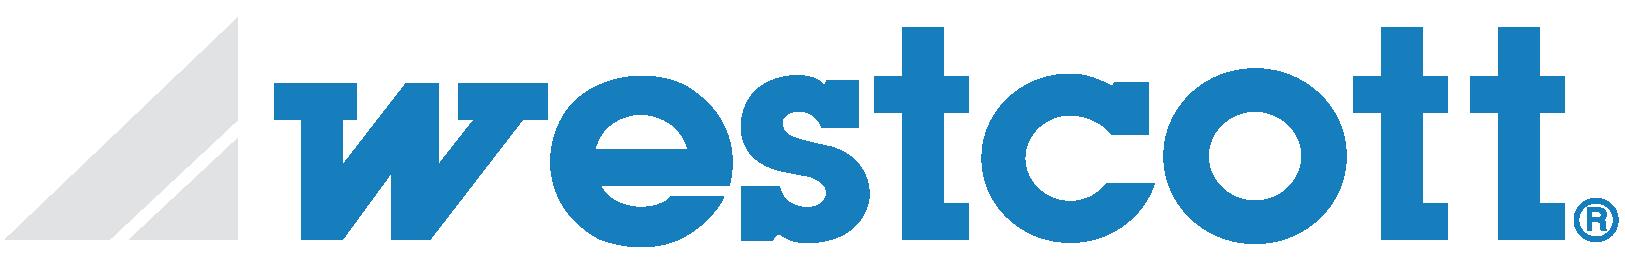 Westcott-LOGO-02.png